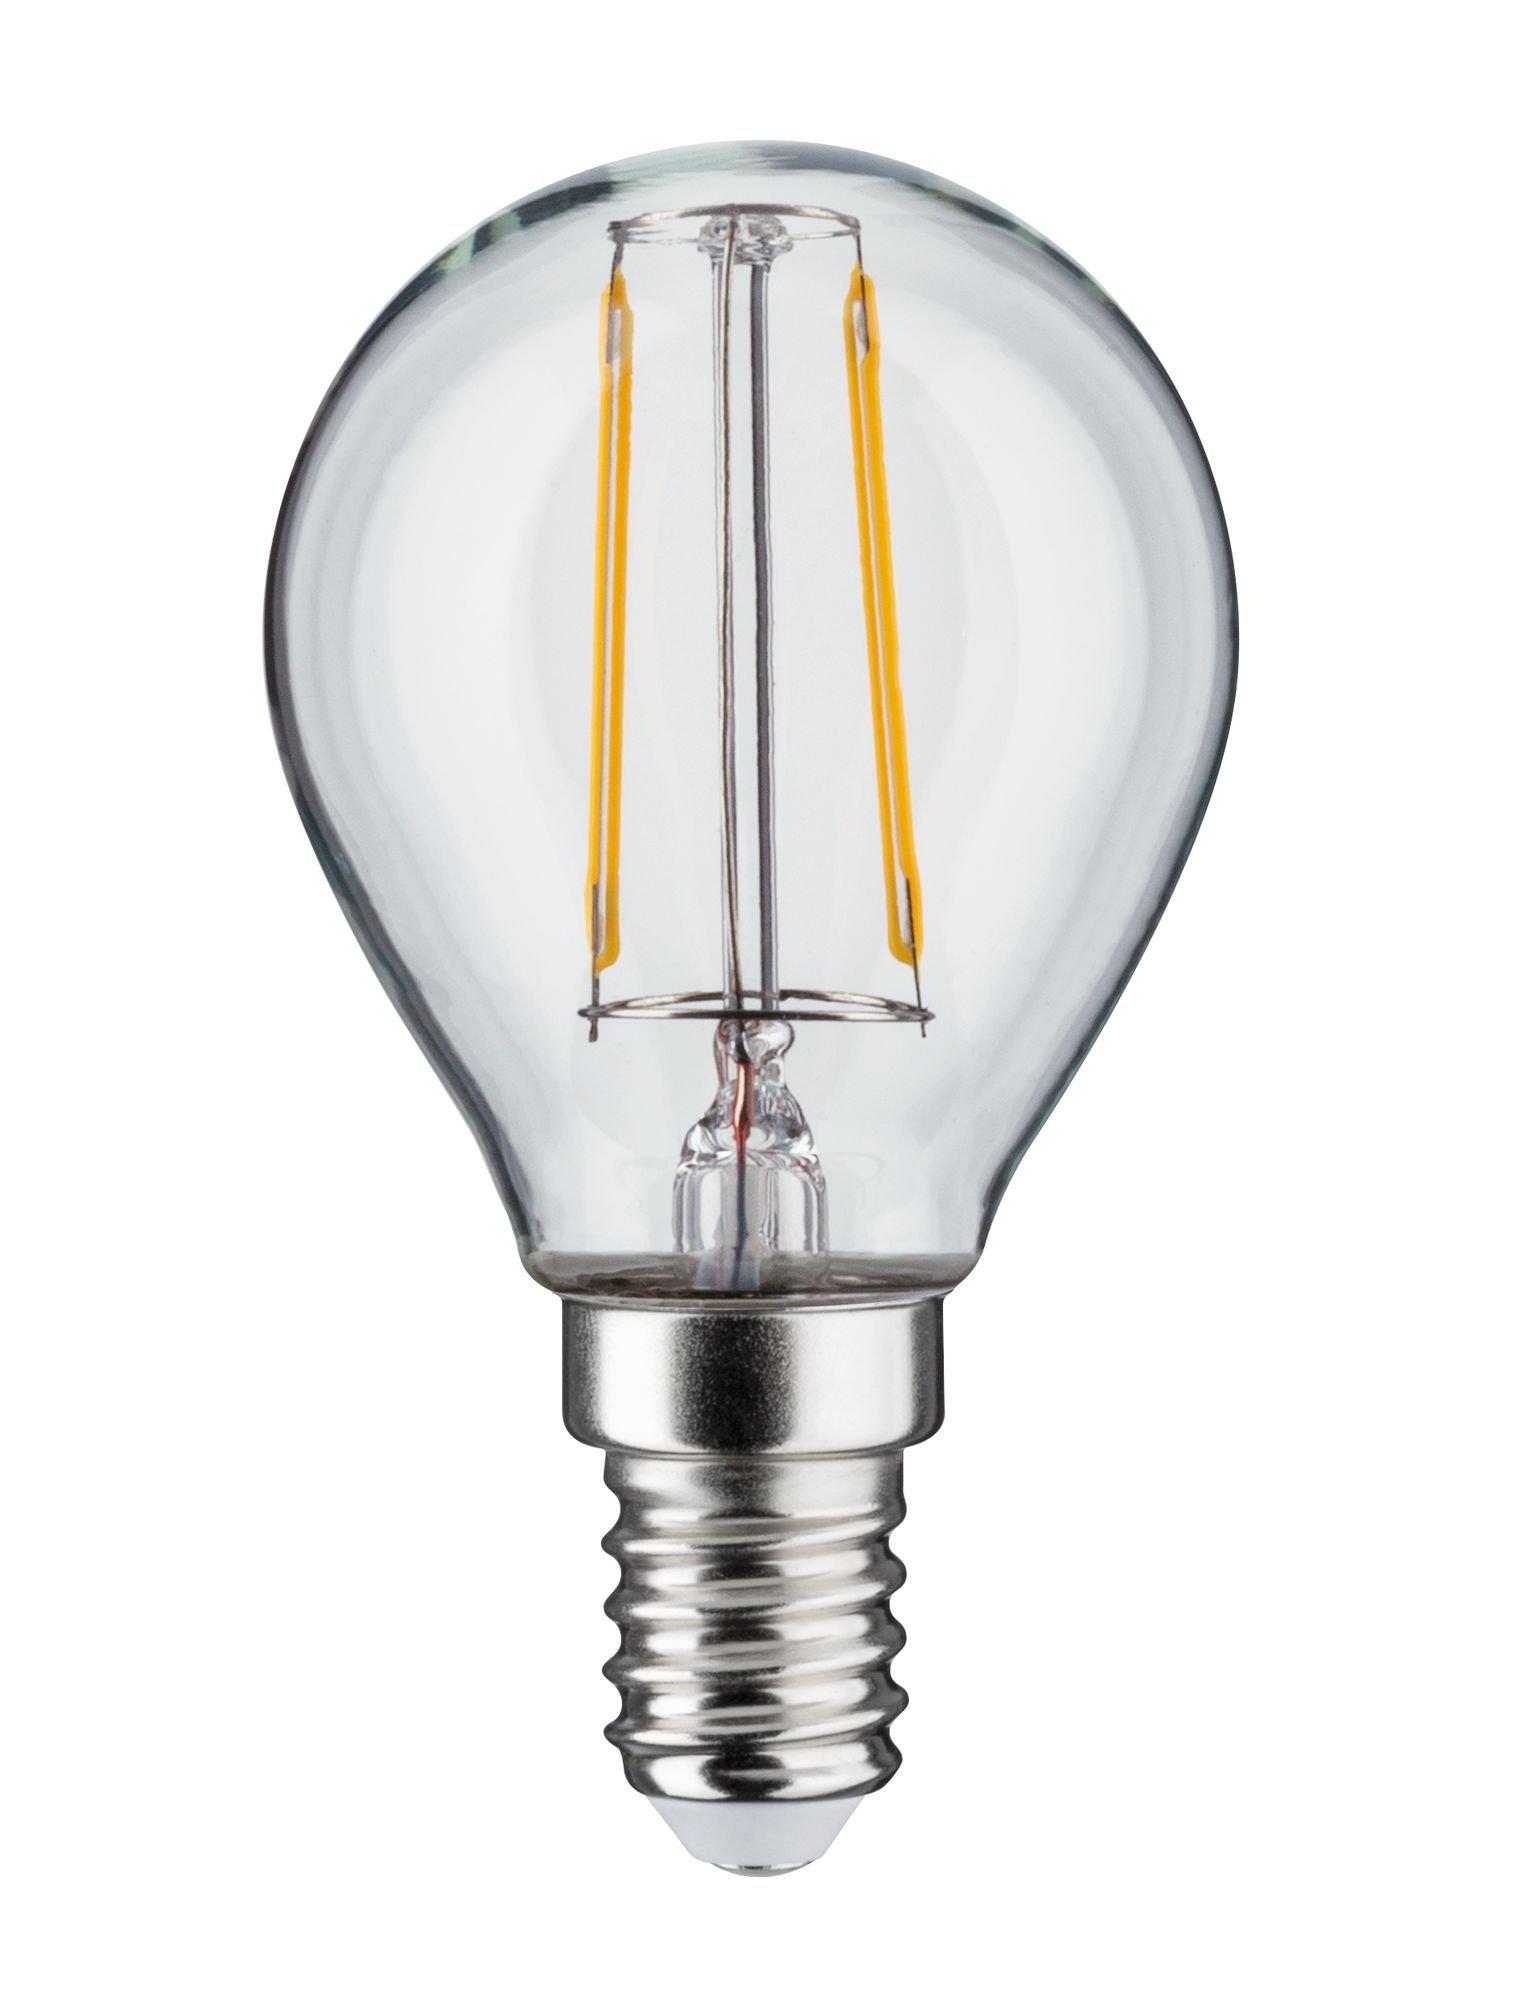 LED-kogellamp Filament E14 230V 250lm 2,6W 2700K Helder